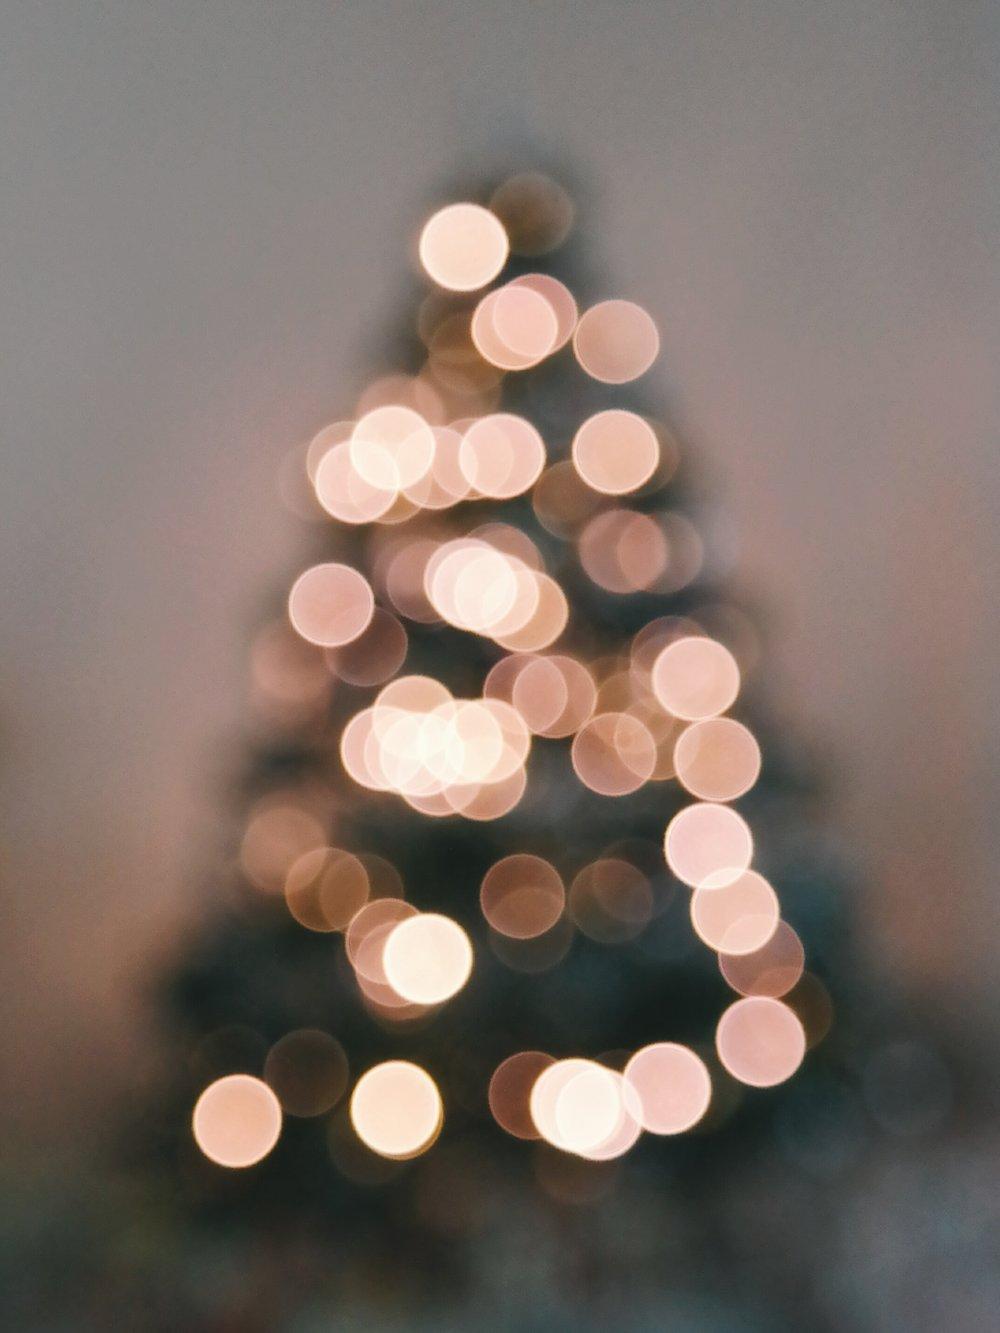 blurred-bokeh-christmas-253342.jpg